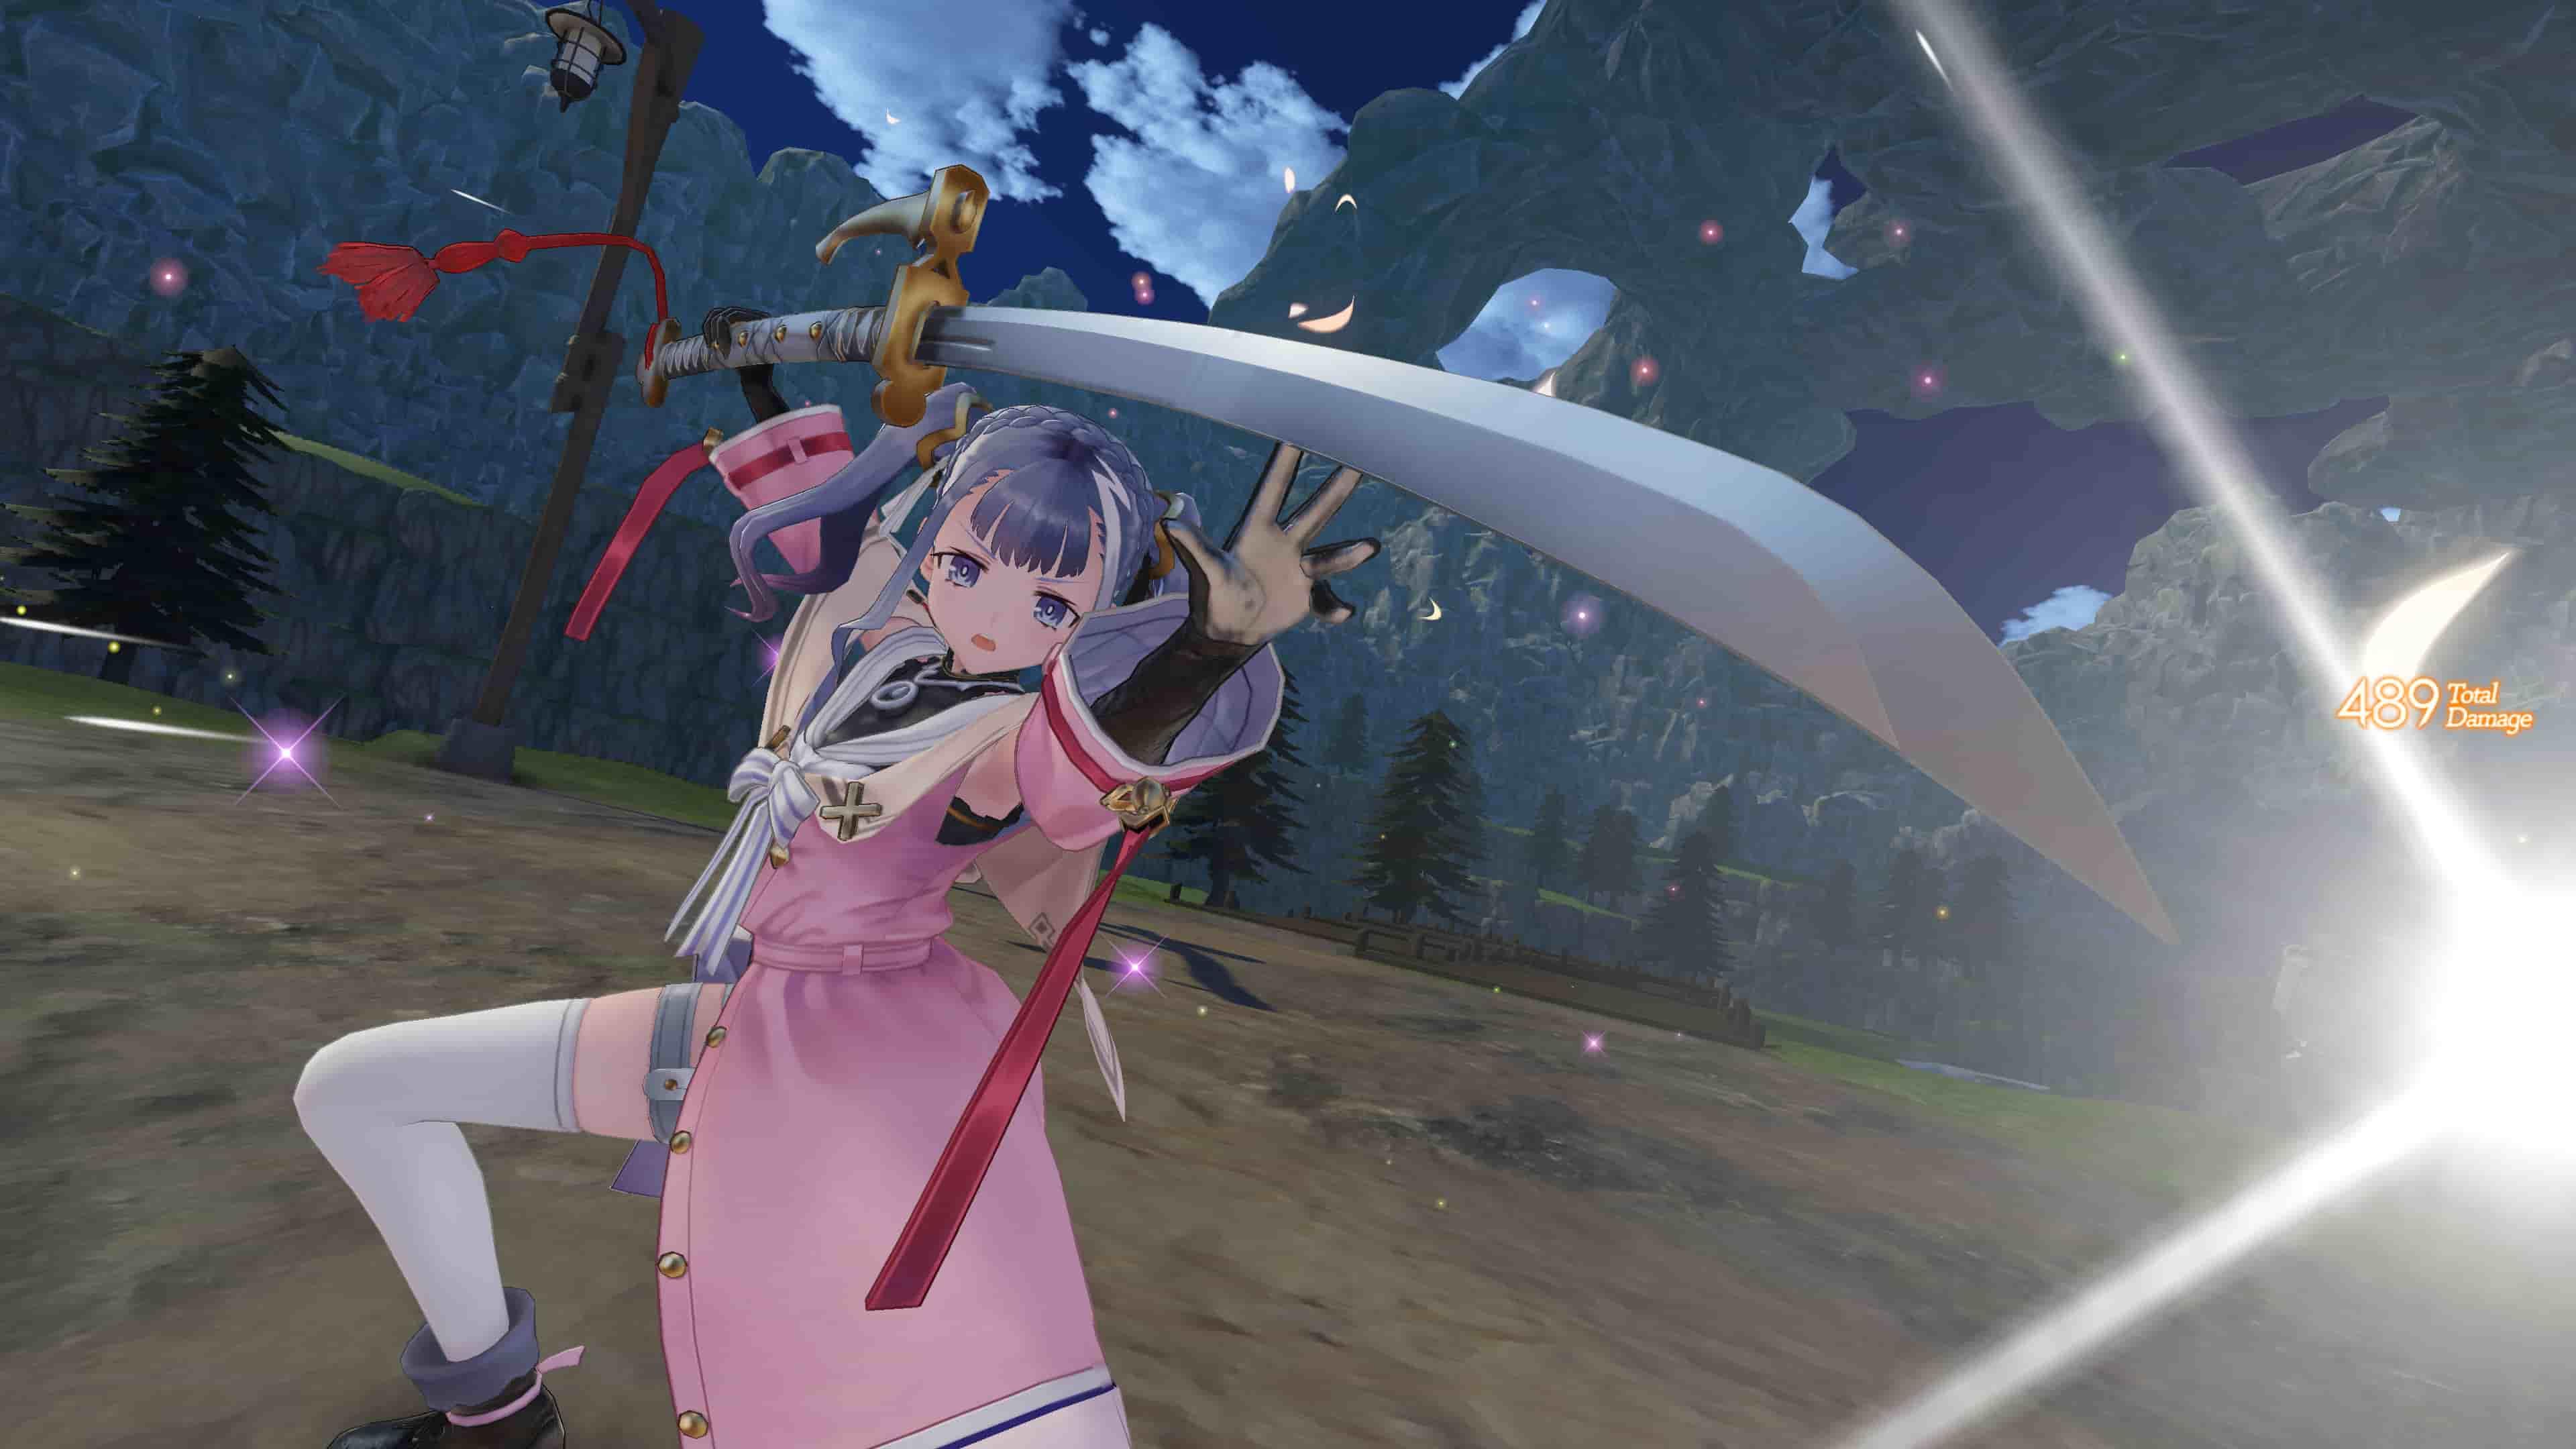 Atelier Ryza 2: Lost Legends & the Secret Fairy preview 03